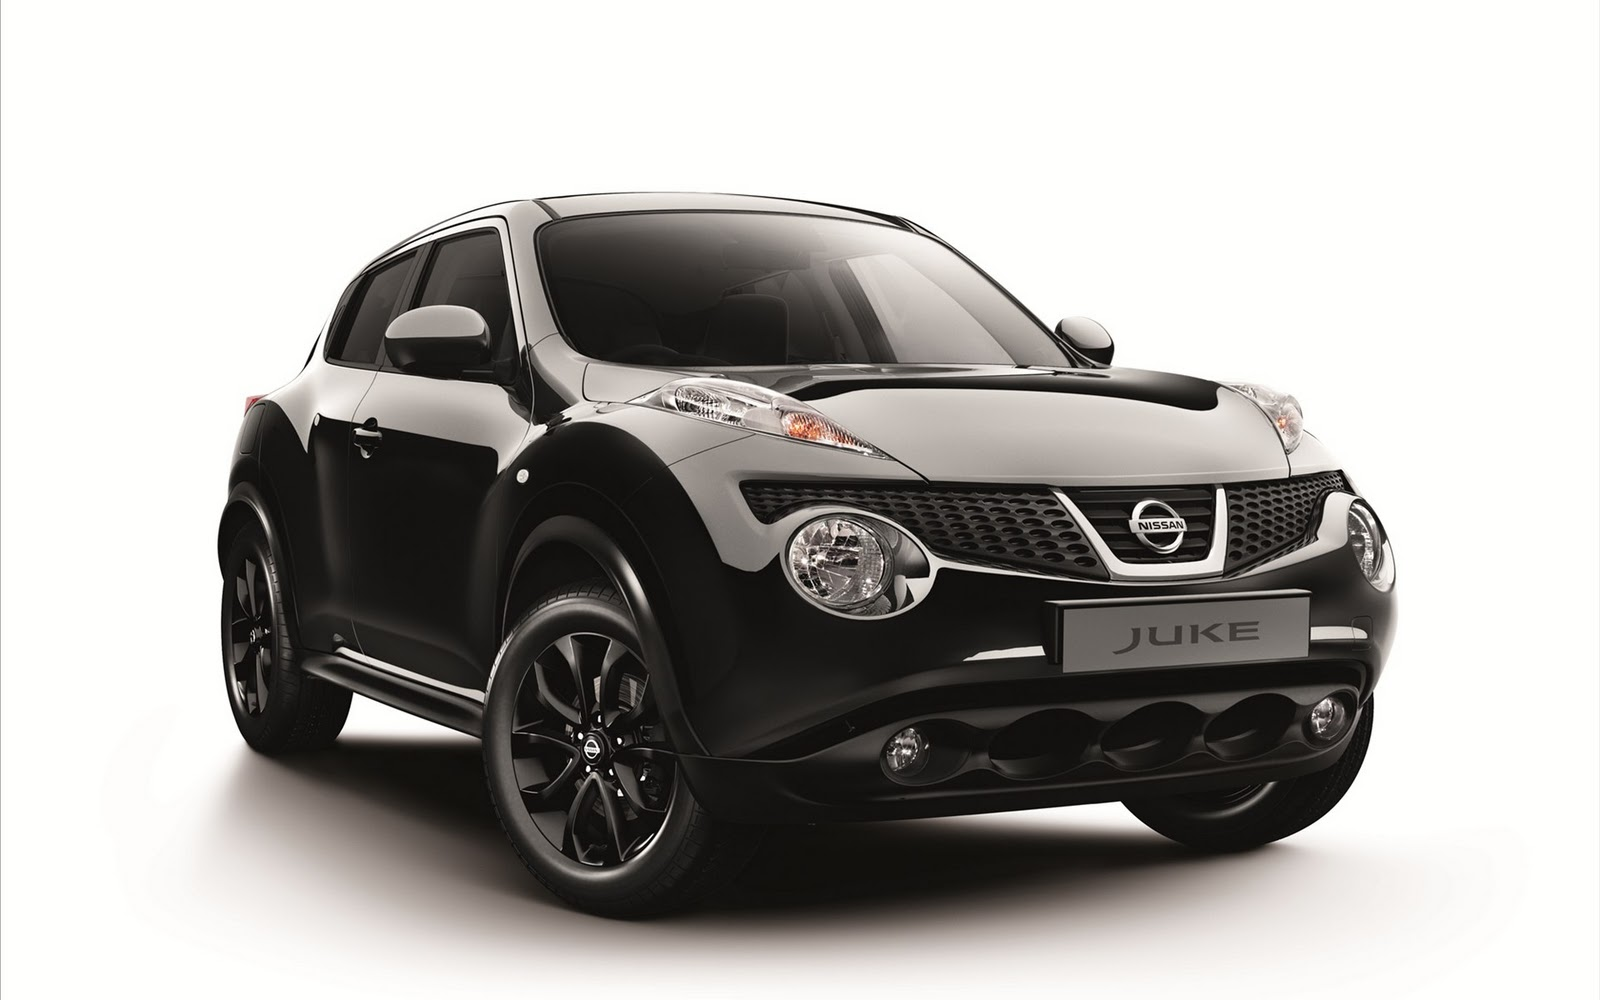 Kendall Self Drive: 2012 Nissan Juke Kuro Edition Review